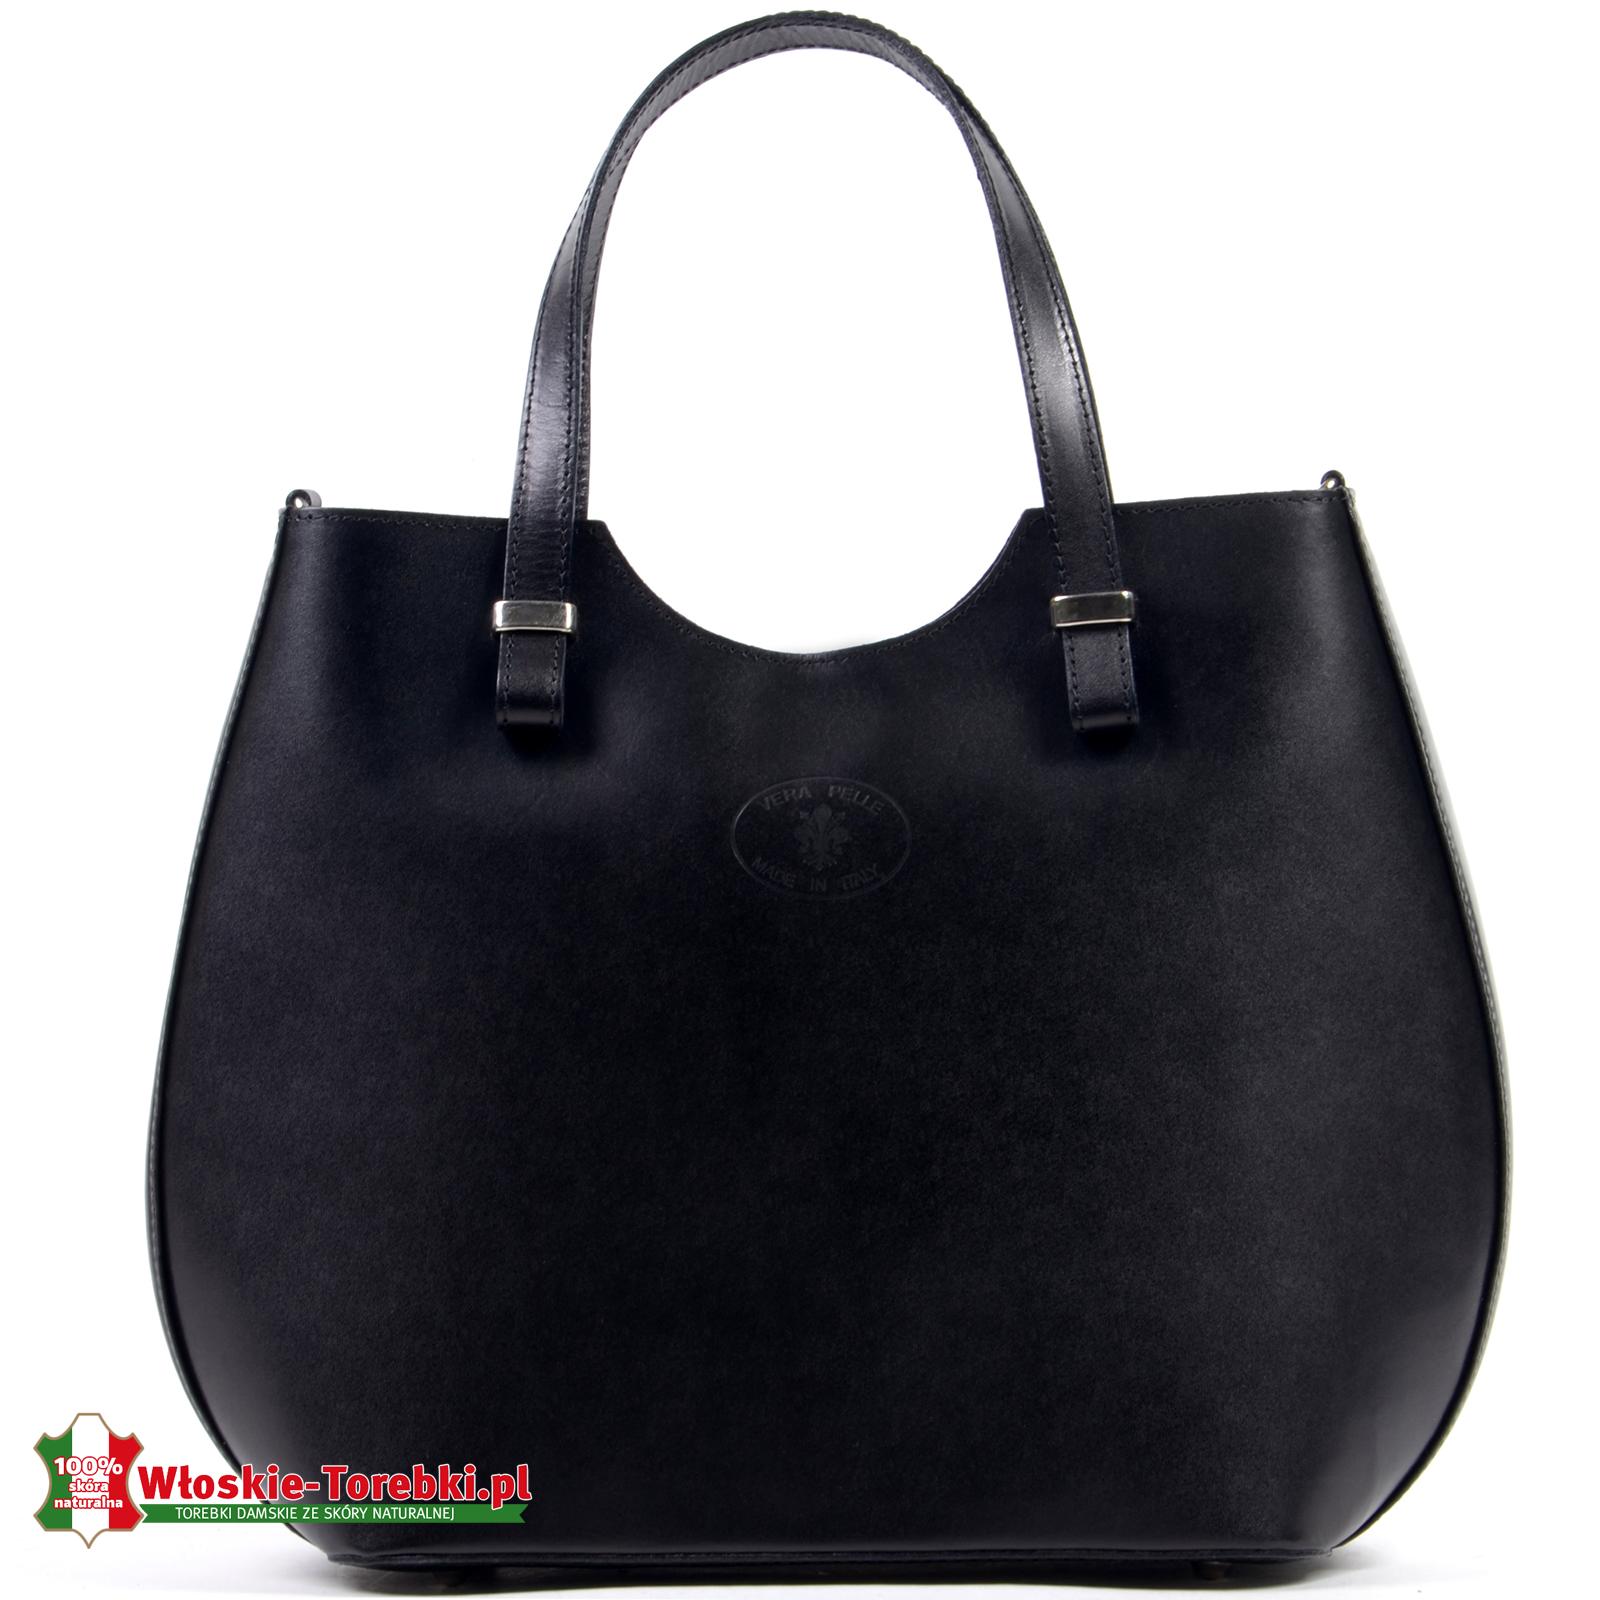 ab9d5e00e59e2 Czarna torba Fulvia ze skóry - owalny kształt